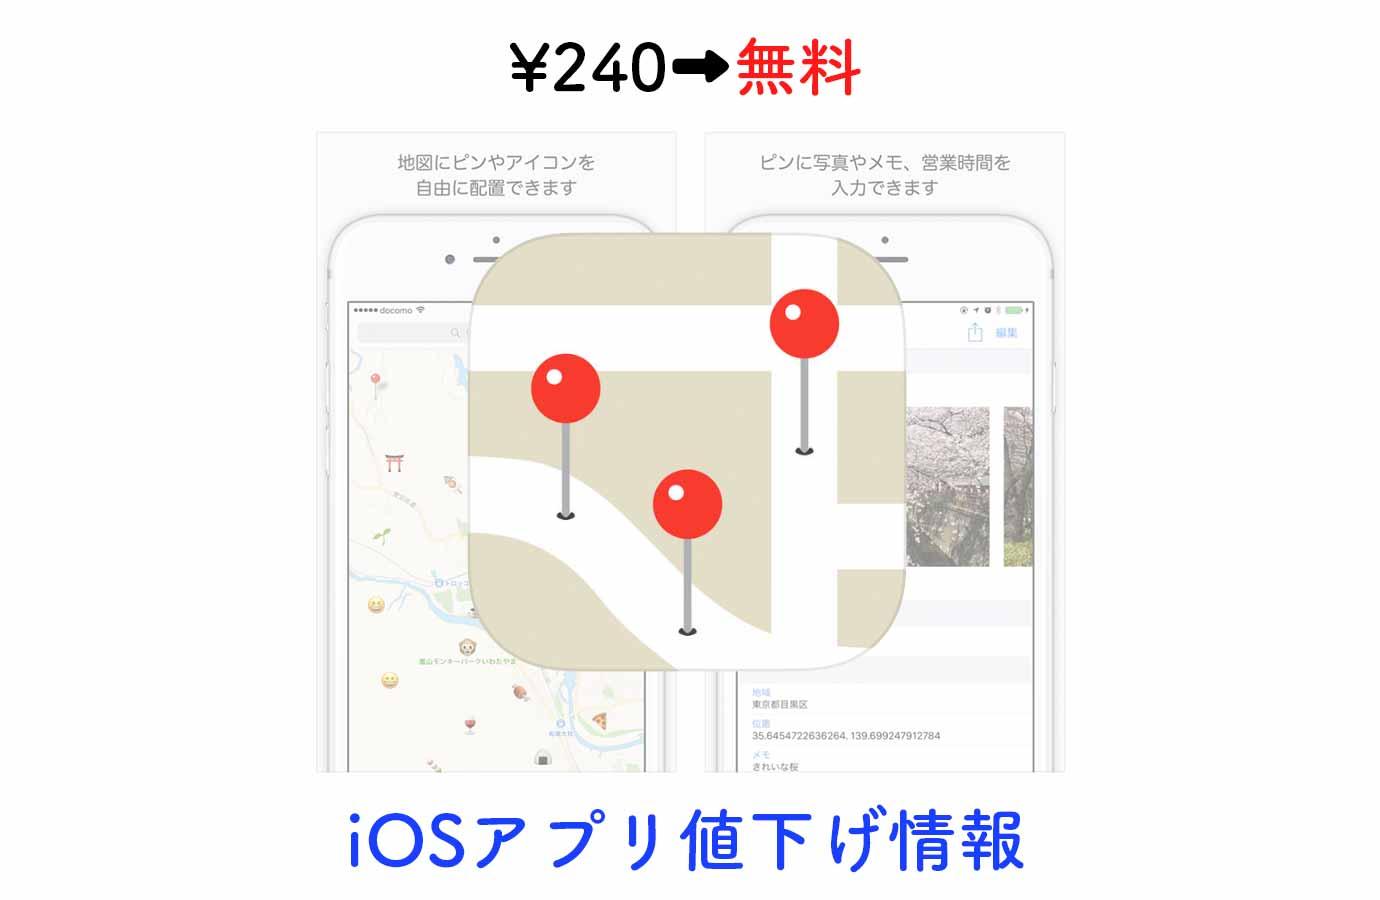 Appsale0718